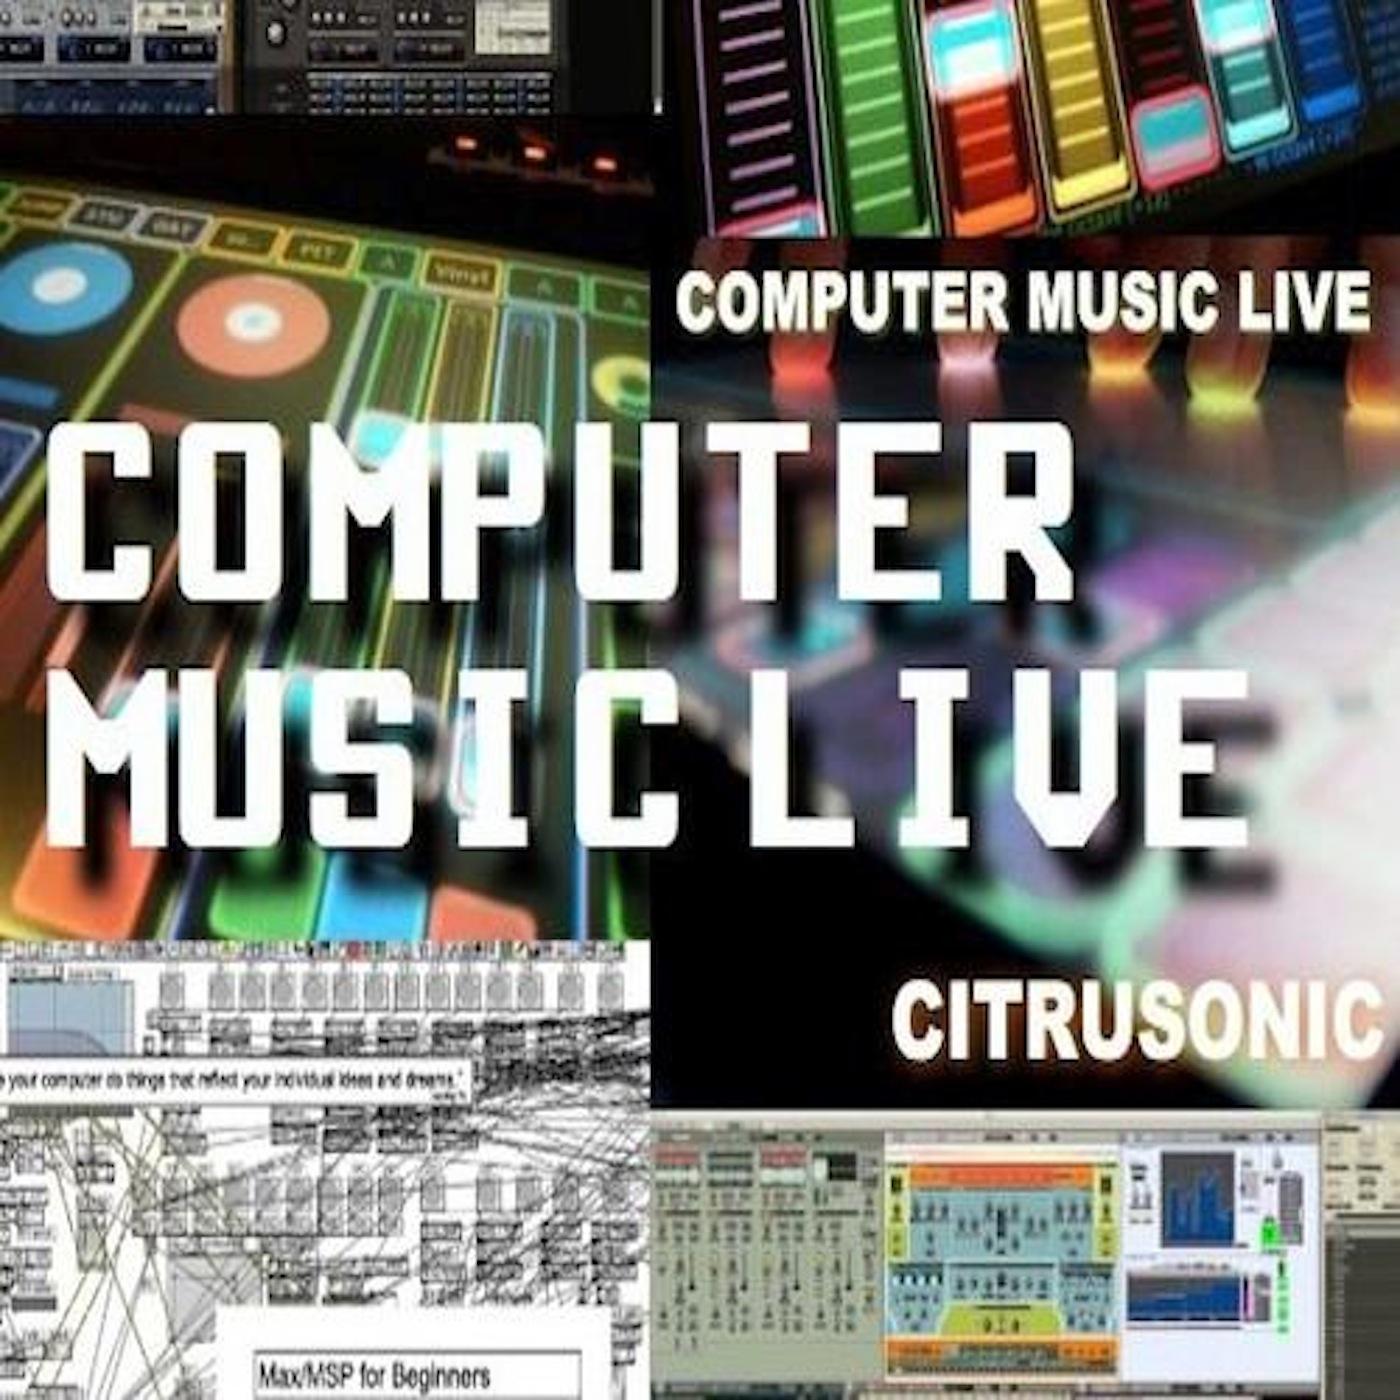 Drum and Bass Dubstep IDM EDM DNB | Hip Hop Beats | Reaktor Midi Synthesizer | Sound Design & License  | Computer Music Live | Computers LIVE | Hardcore Breakcore Techno show art